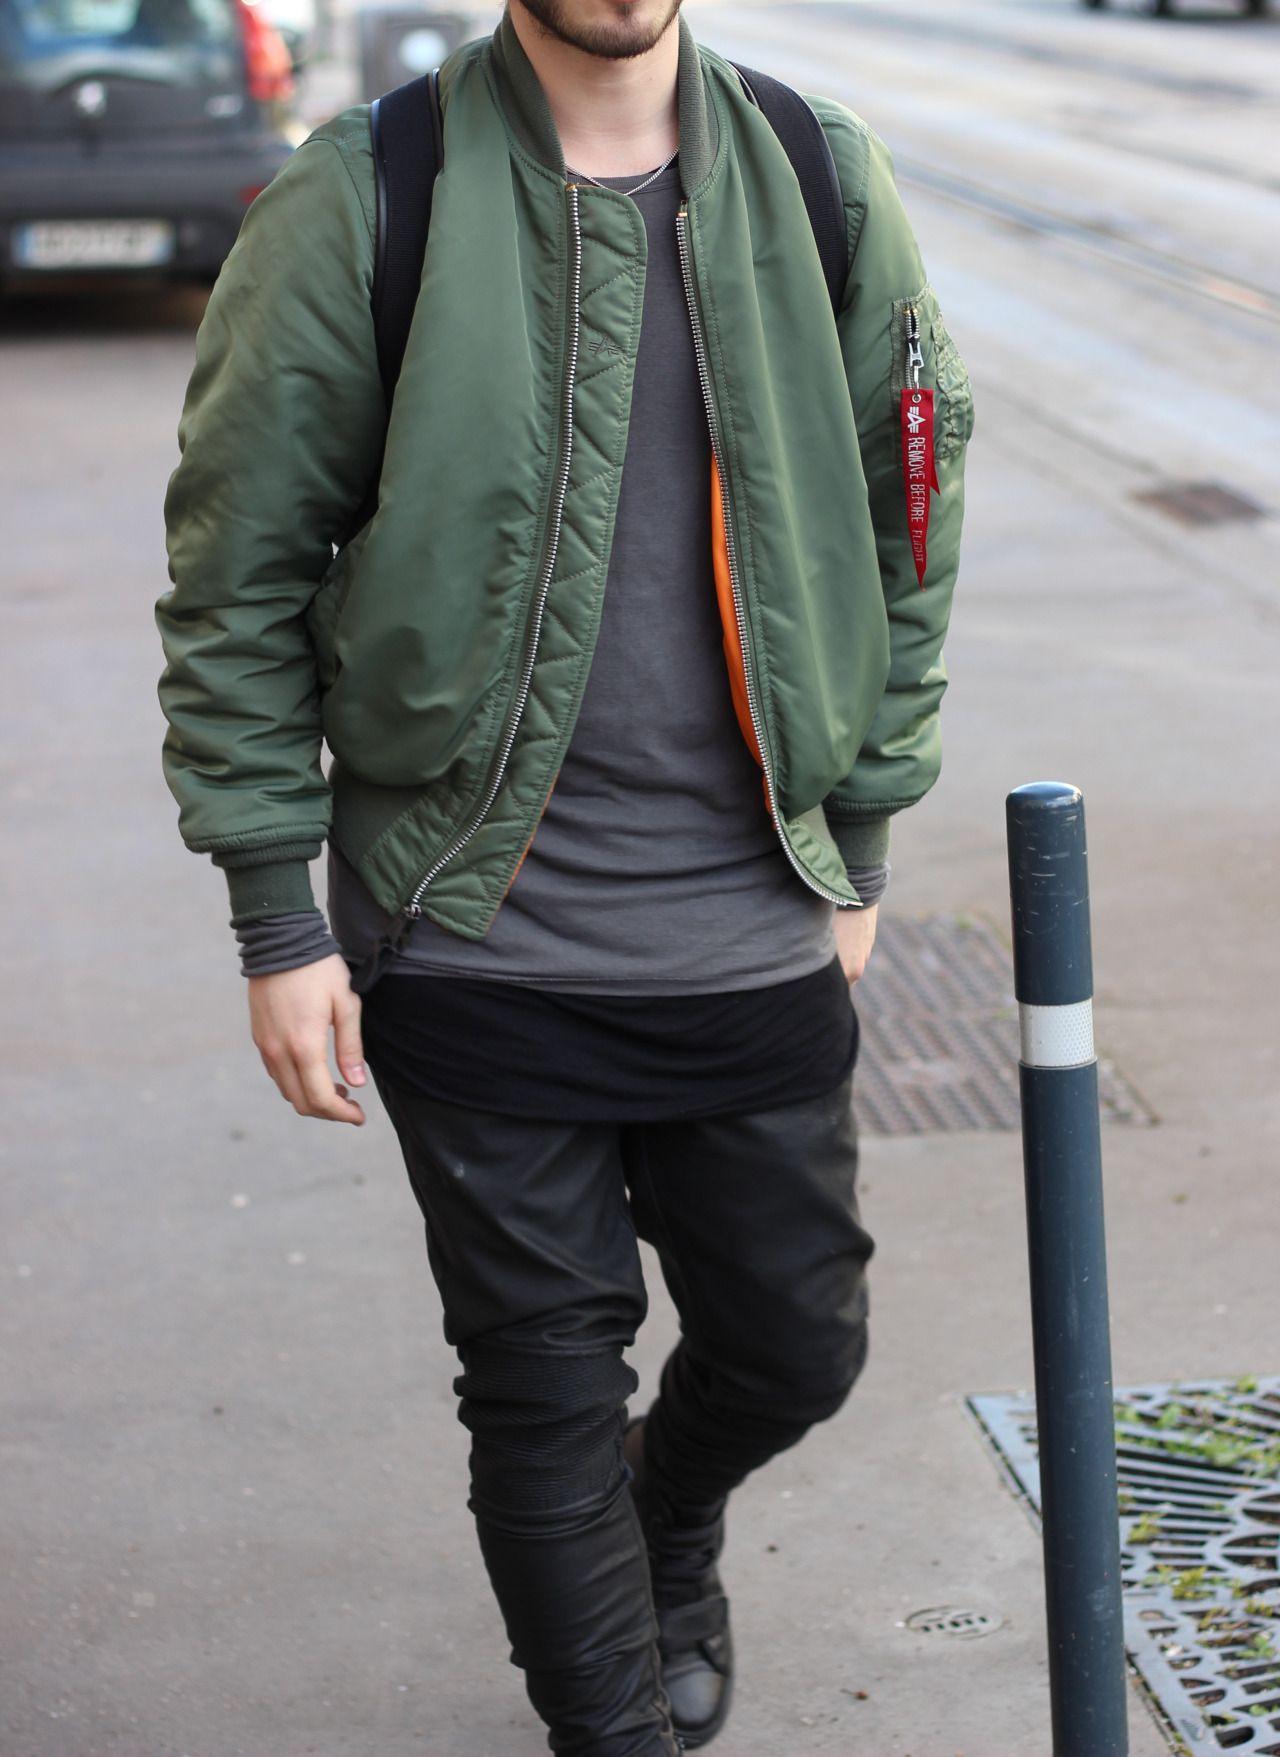 Monochrome And High End Streetwear Green Bomber Jacket Outfit Bomber Jacket Bomber Jacket Outfit [ 1757 x 1280 Pixel ]